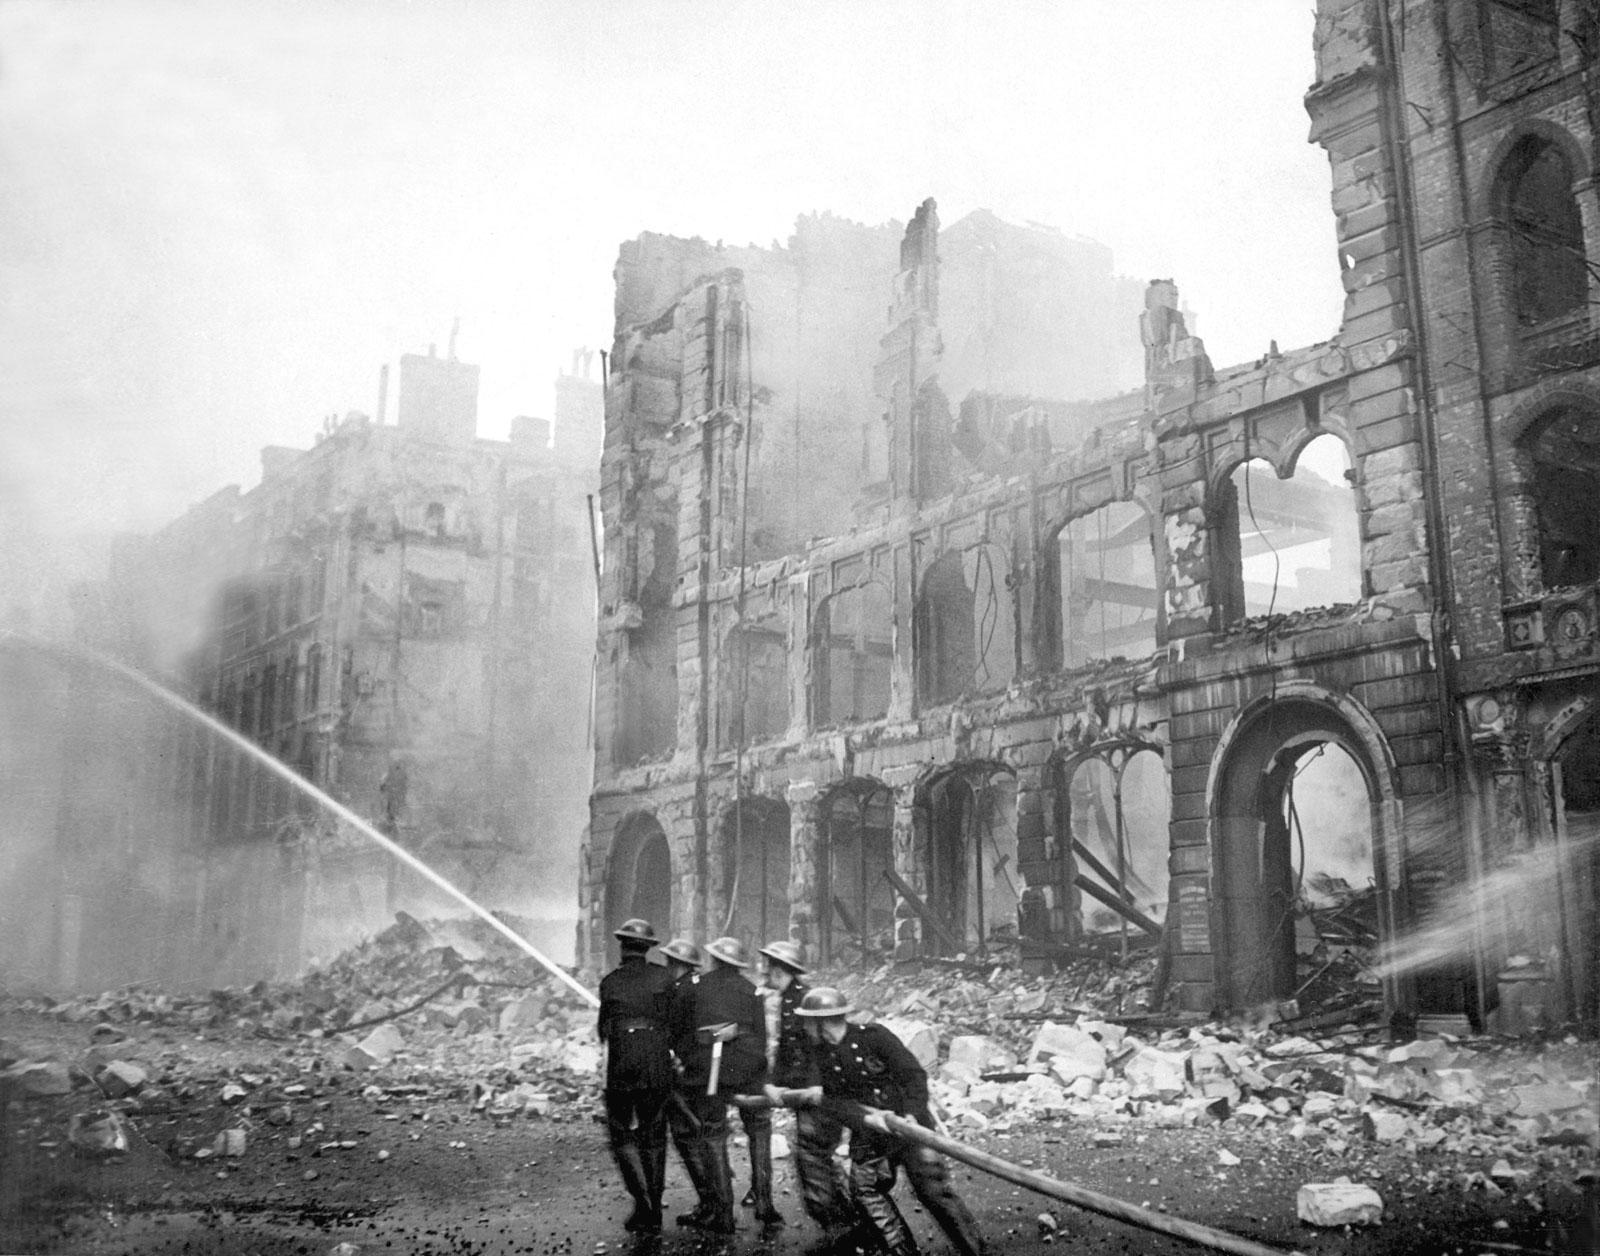 Firemen-work-street-raid-London-1941